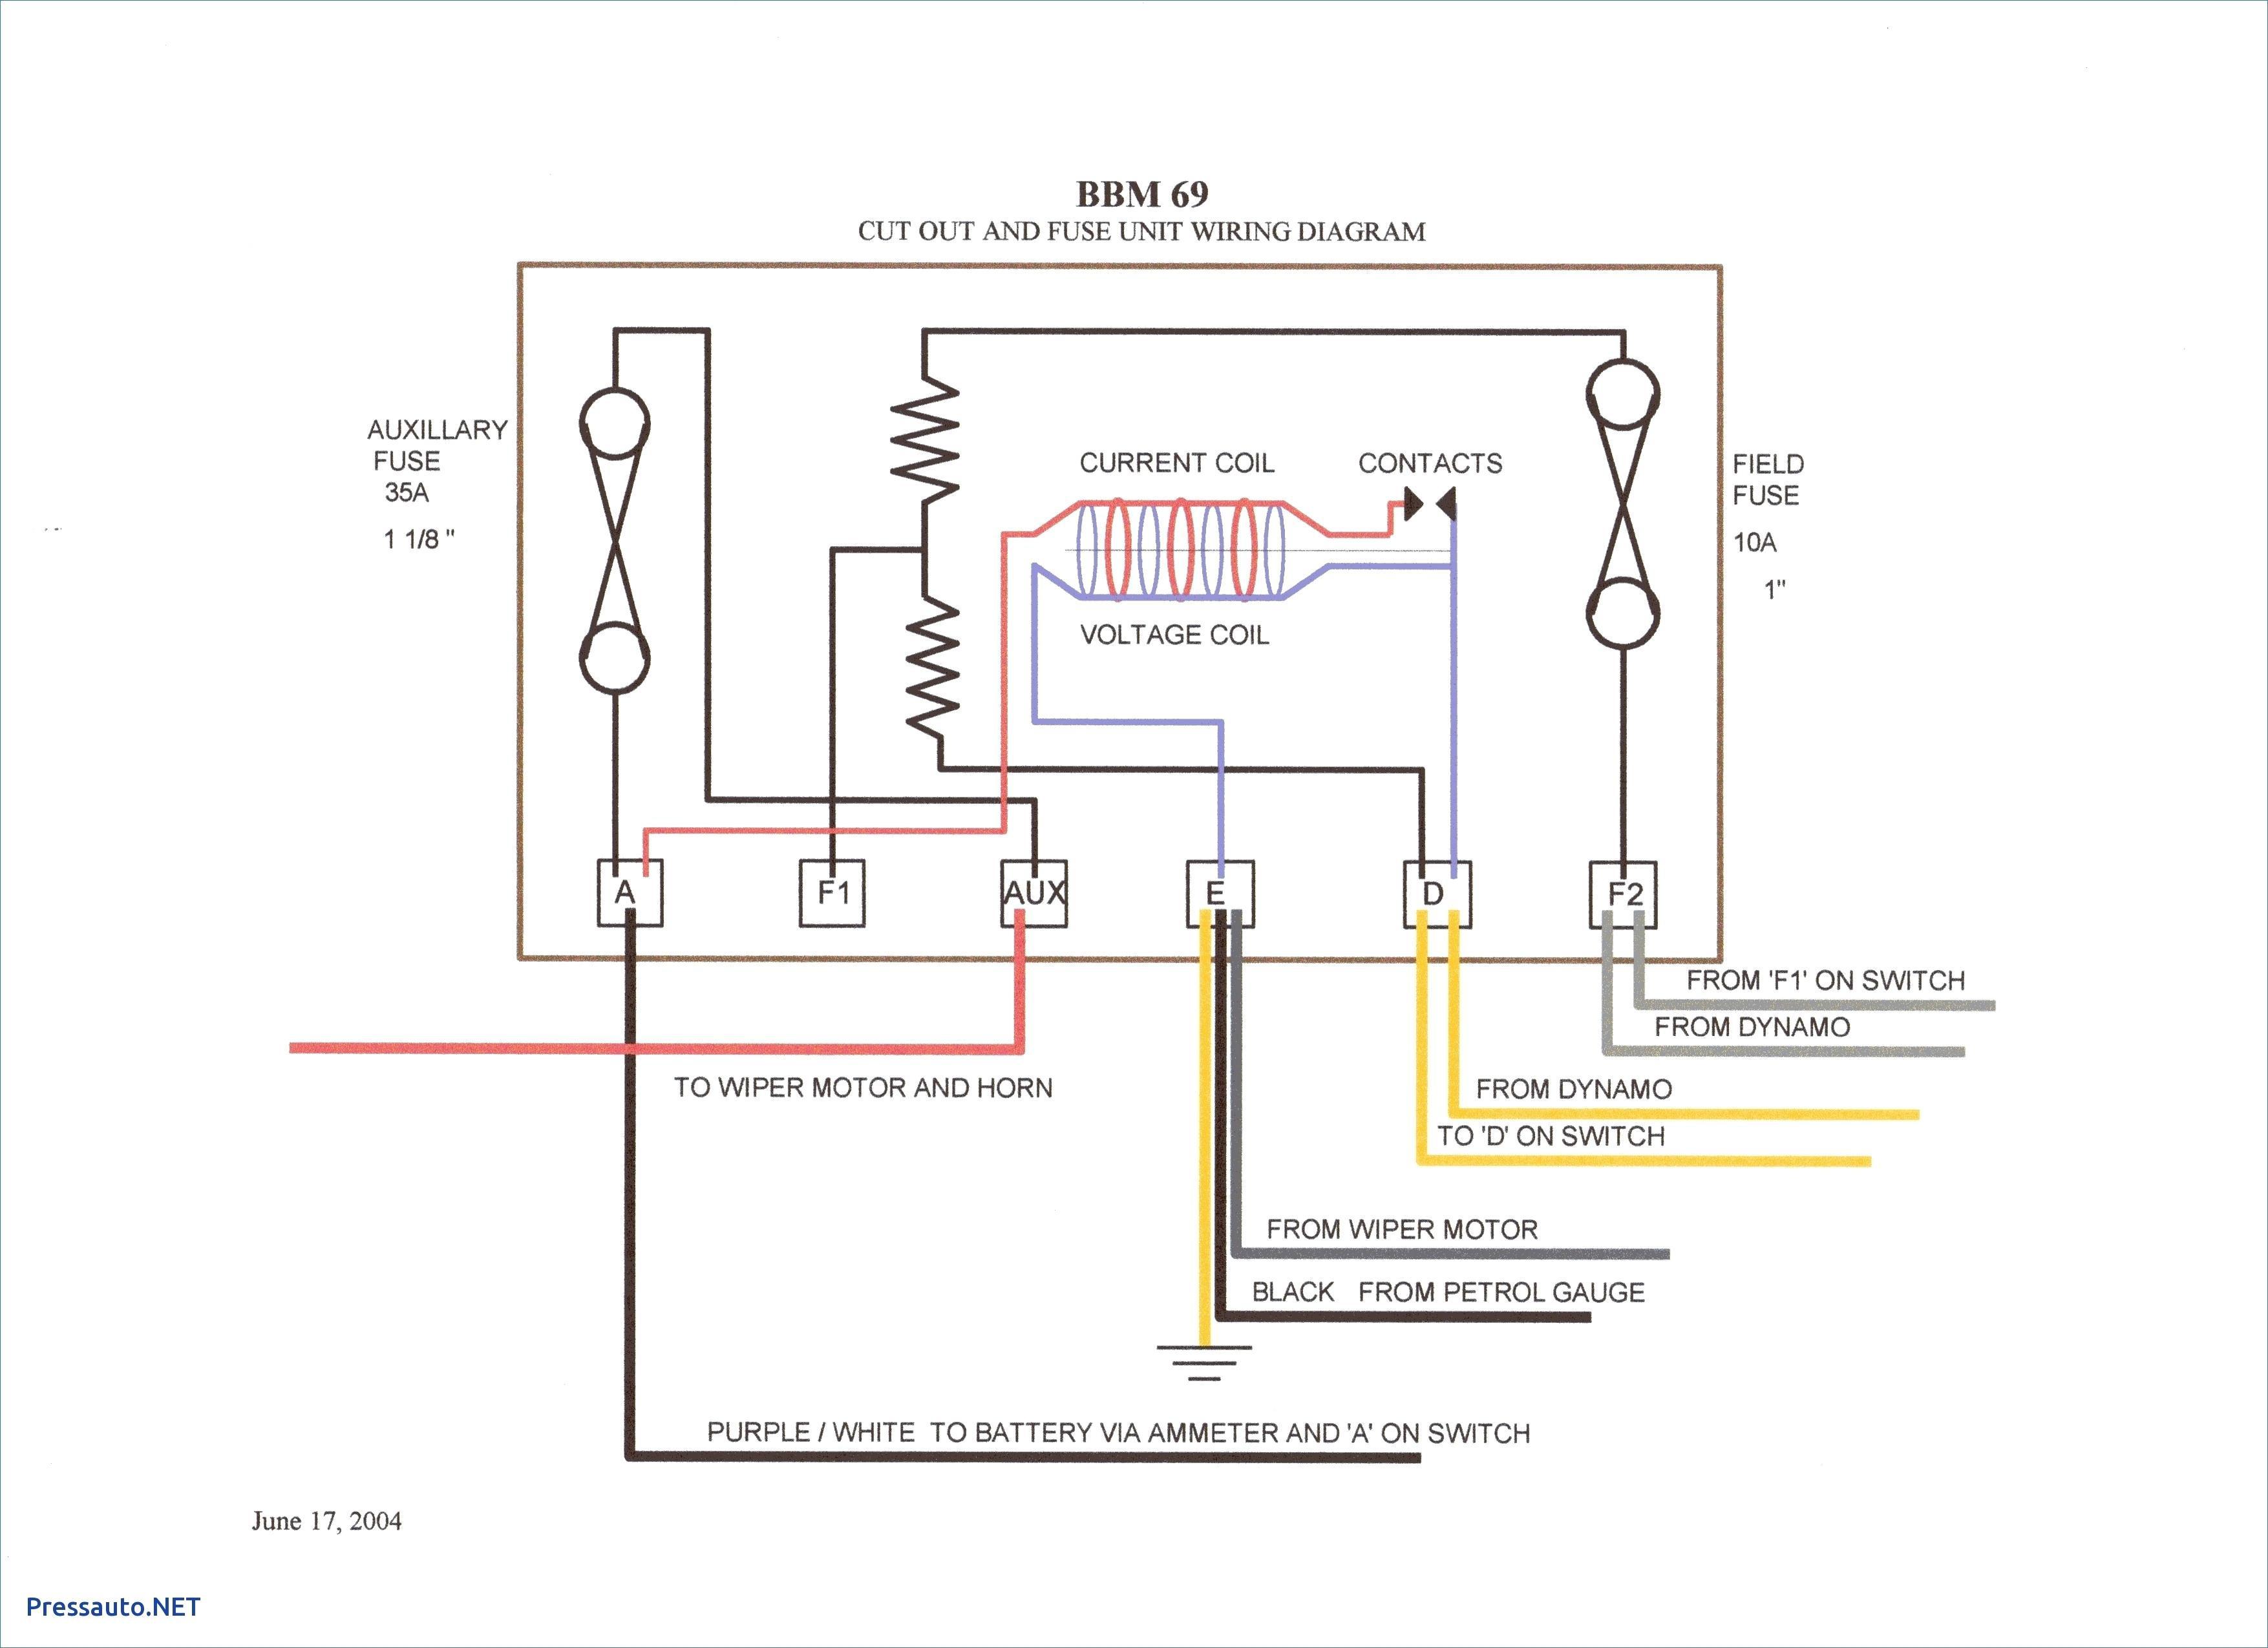 Whirlpool Hot Water Heater Wiring Diagram | Wiring Diagram - Hot Water Heater Wiring Diagram